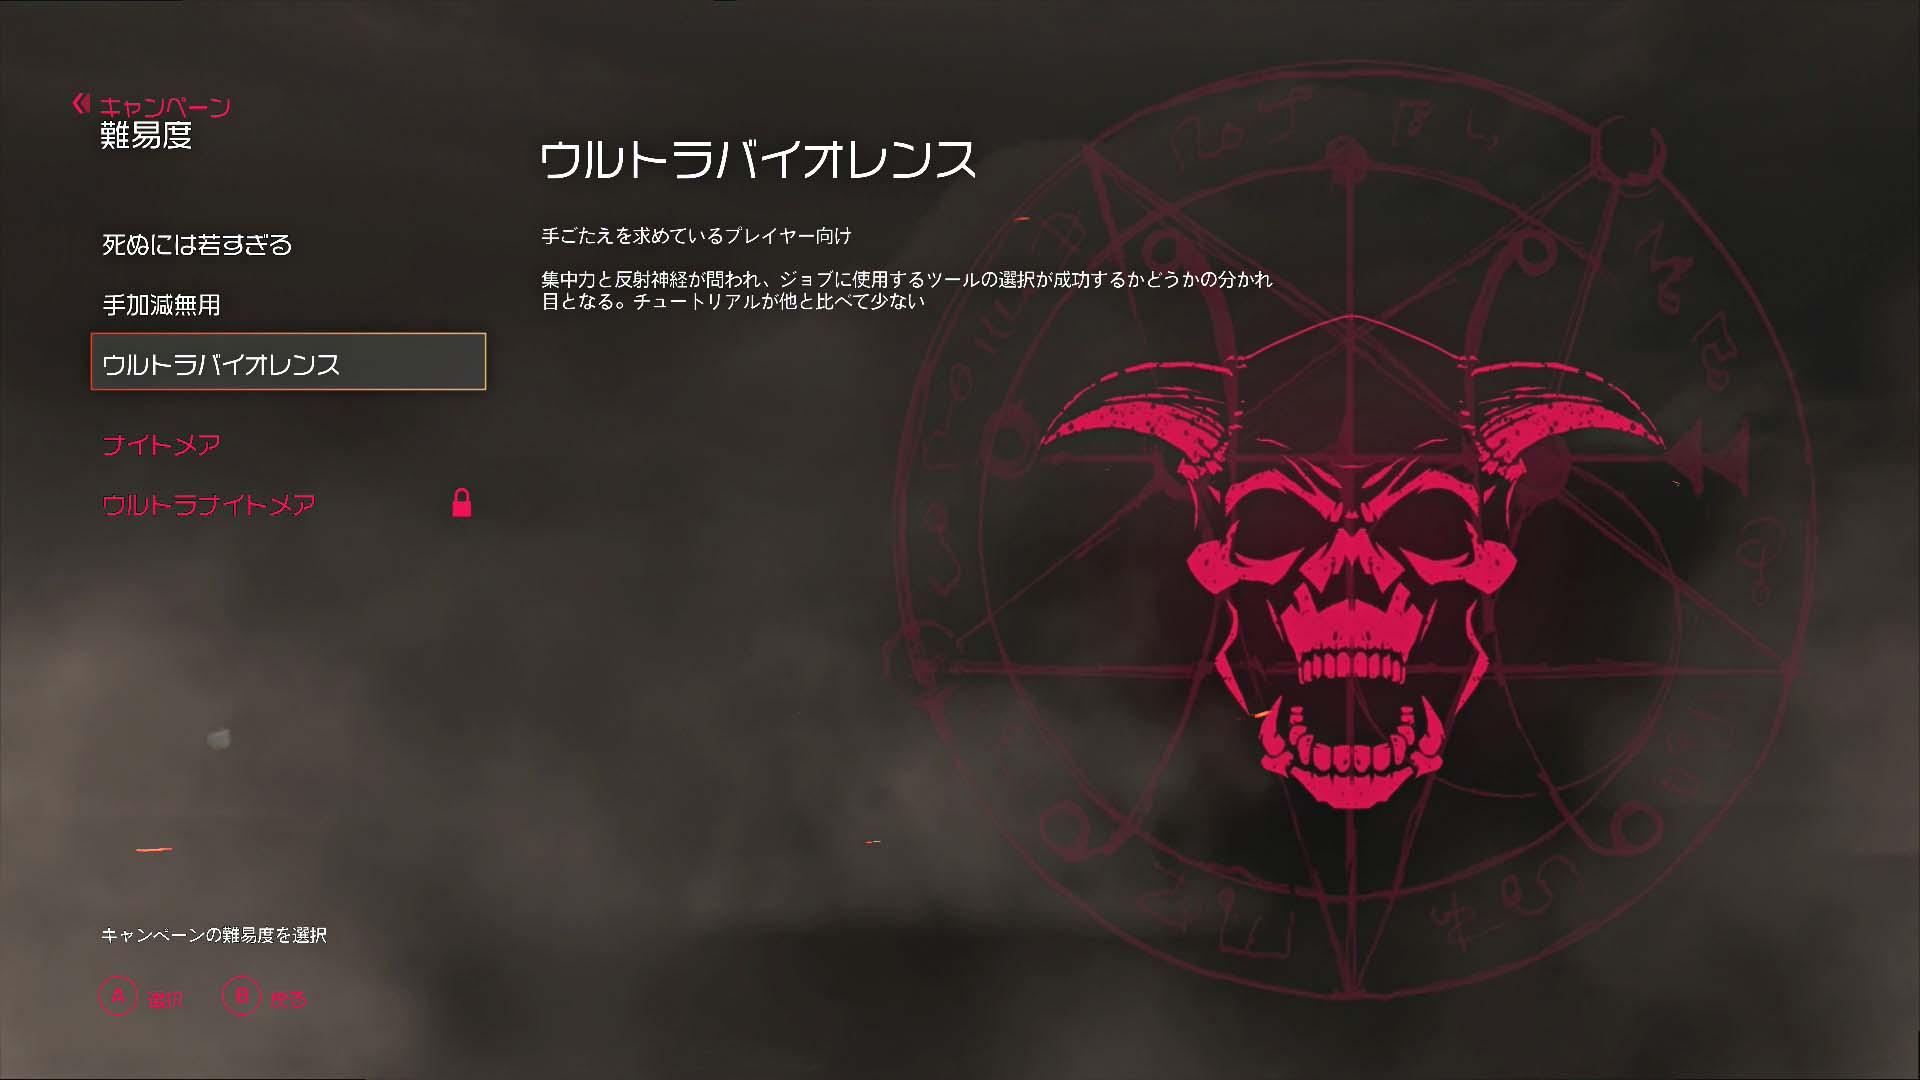 DOOM_01_02.jpg